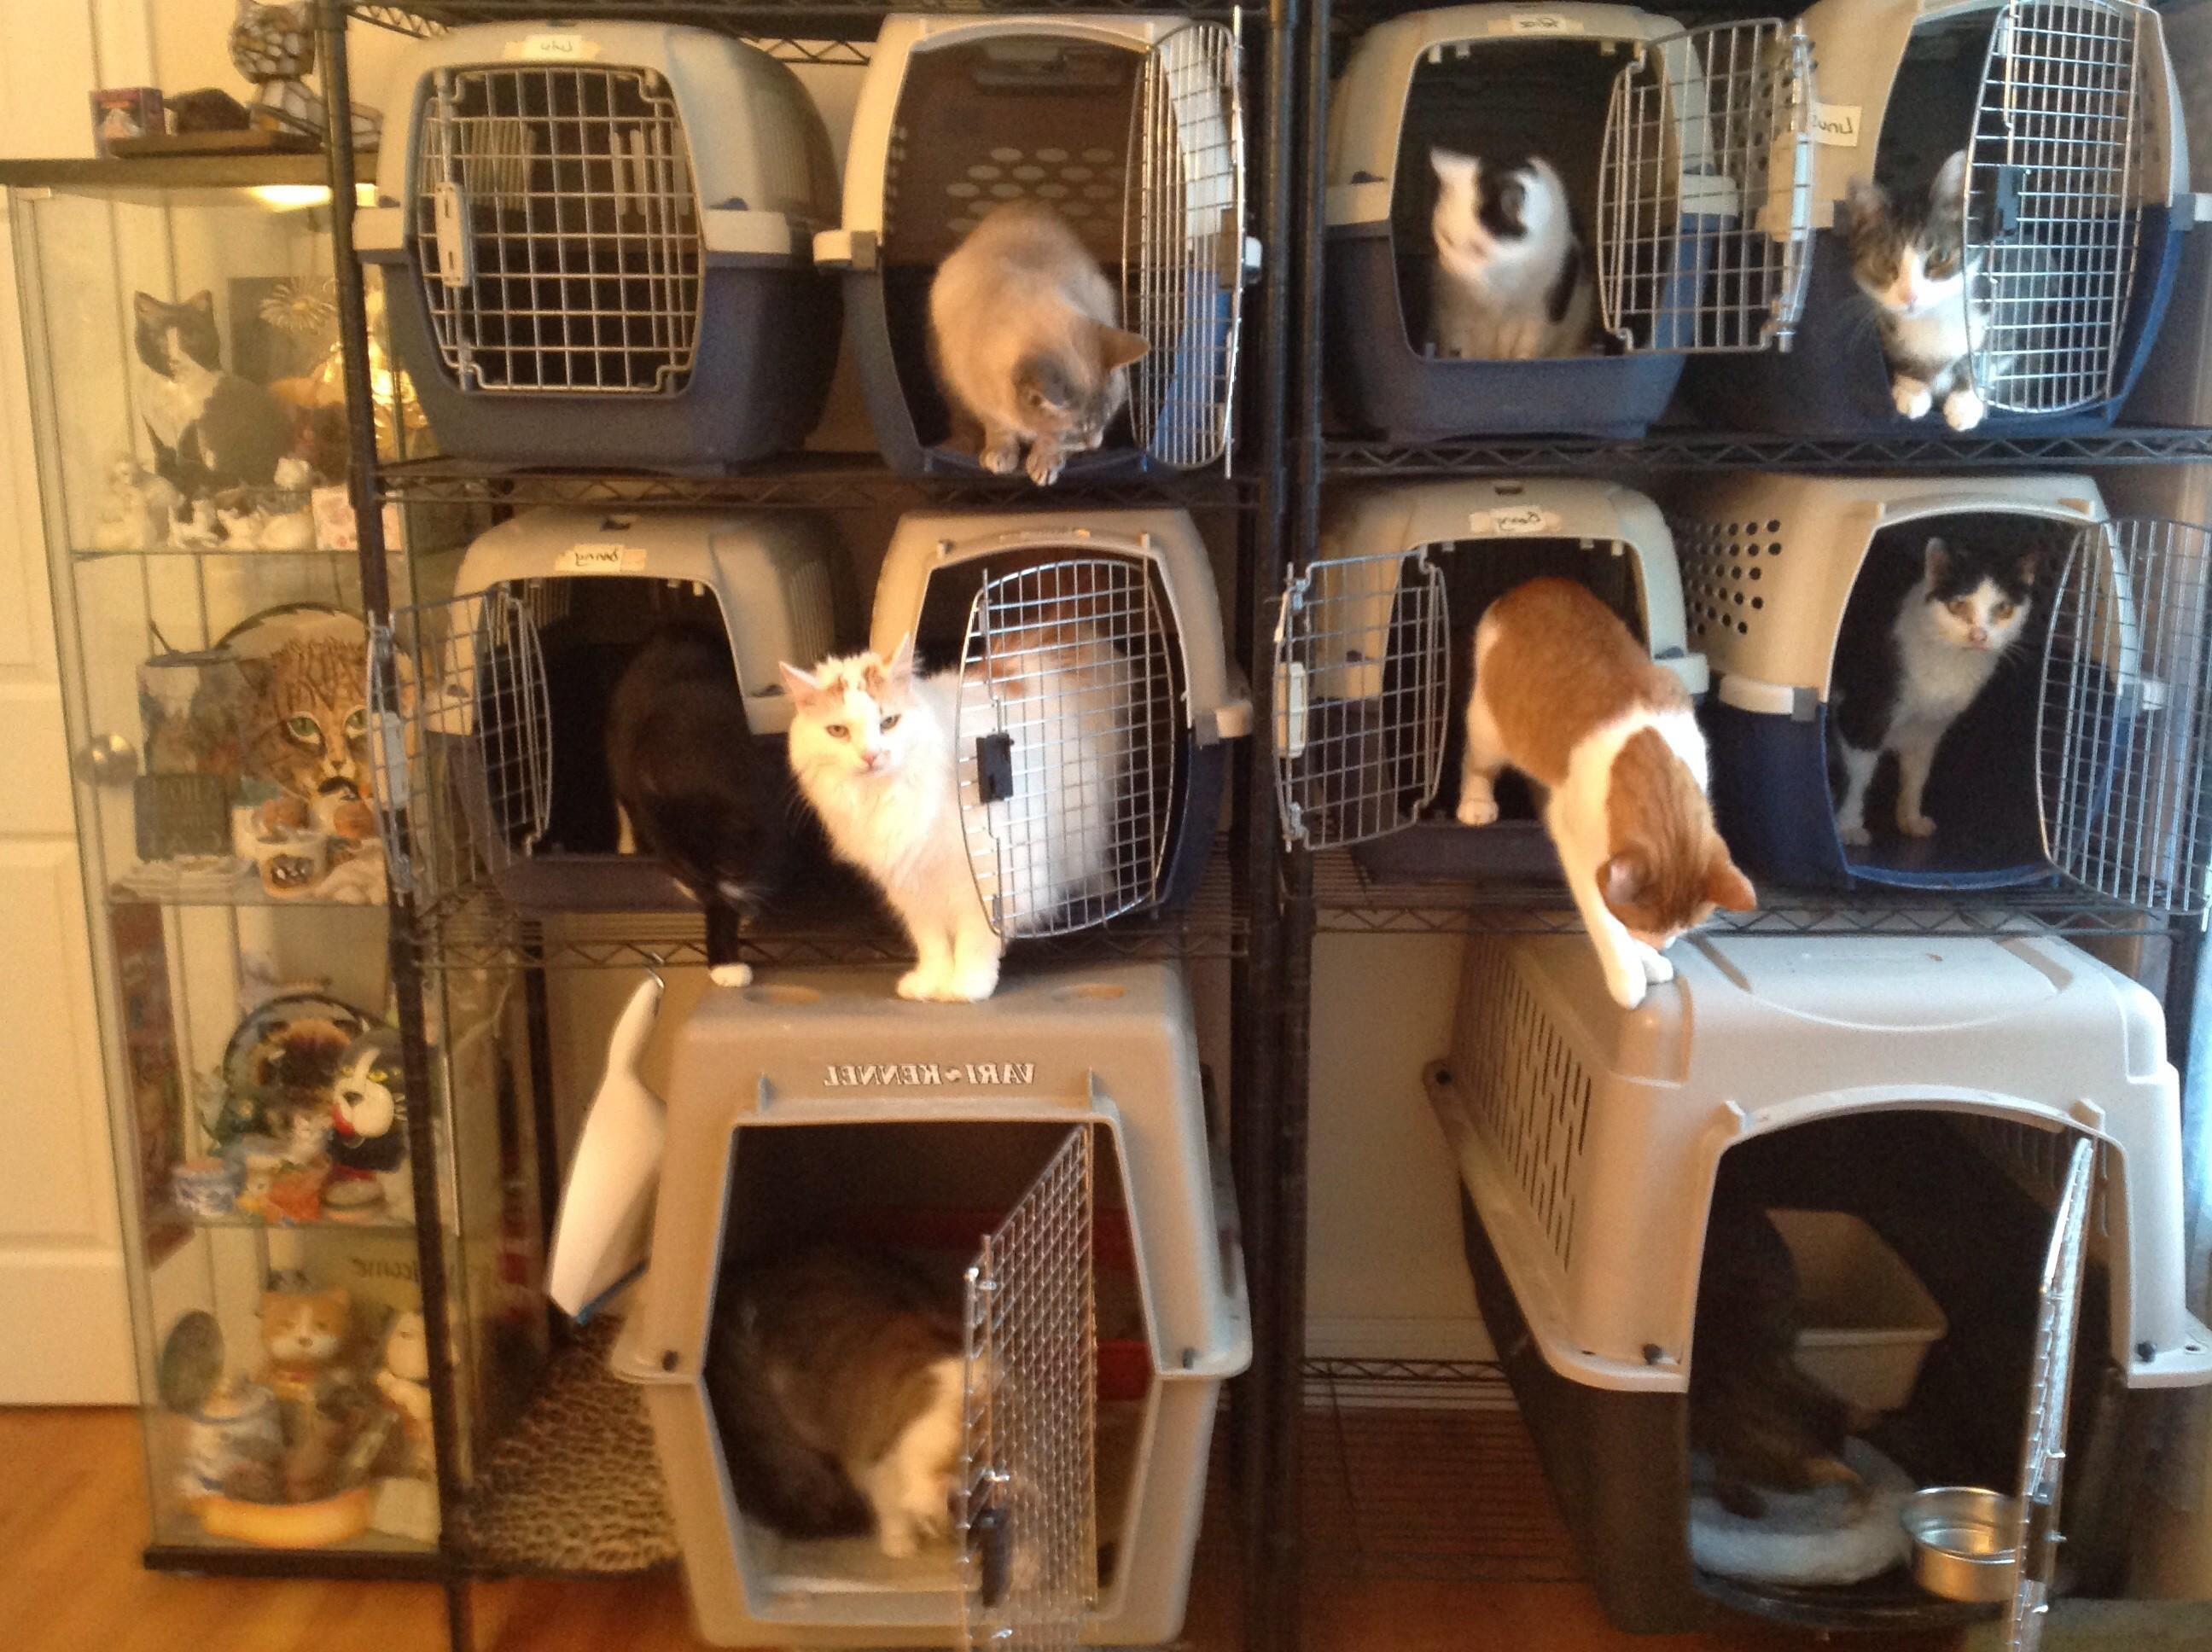 Feeding Time at our house!! Top Row - Linus, Spanky, Felice Middle Row - Ricky, Gus Bennett, Sazar, Lulu Bottom Row - Danny, Desilu By Professional Pet Sitting Etc.